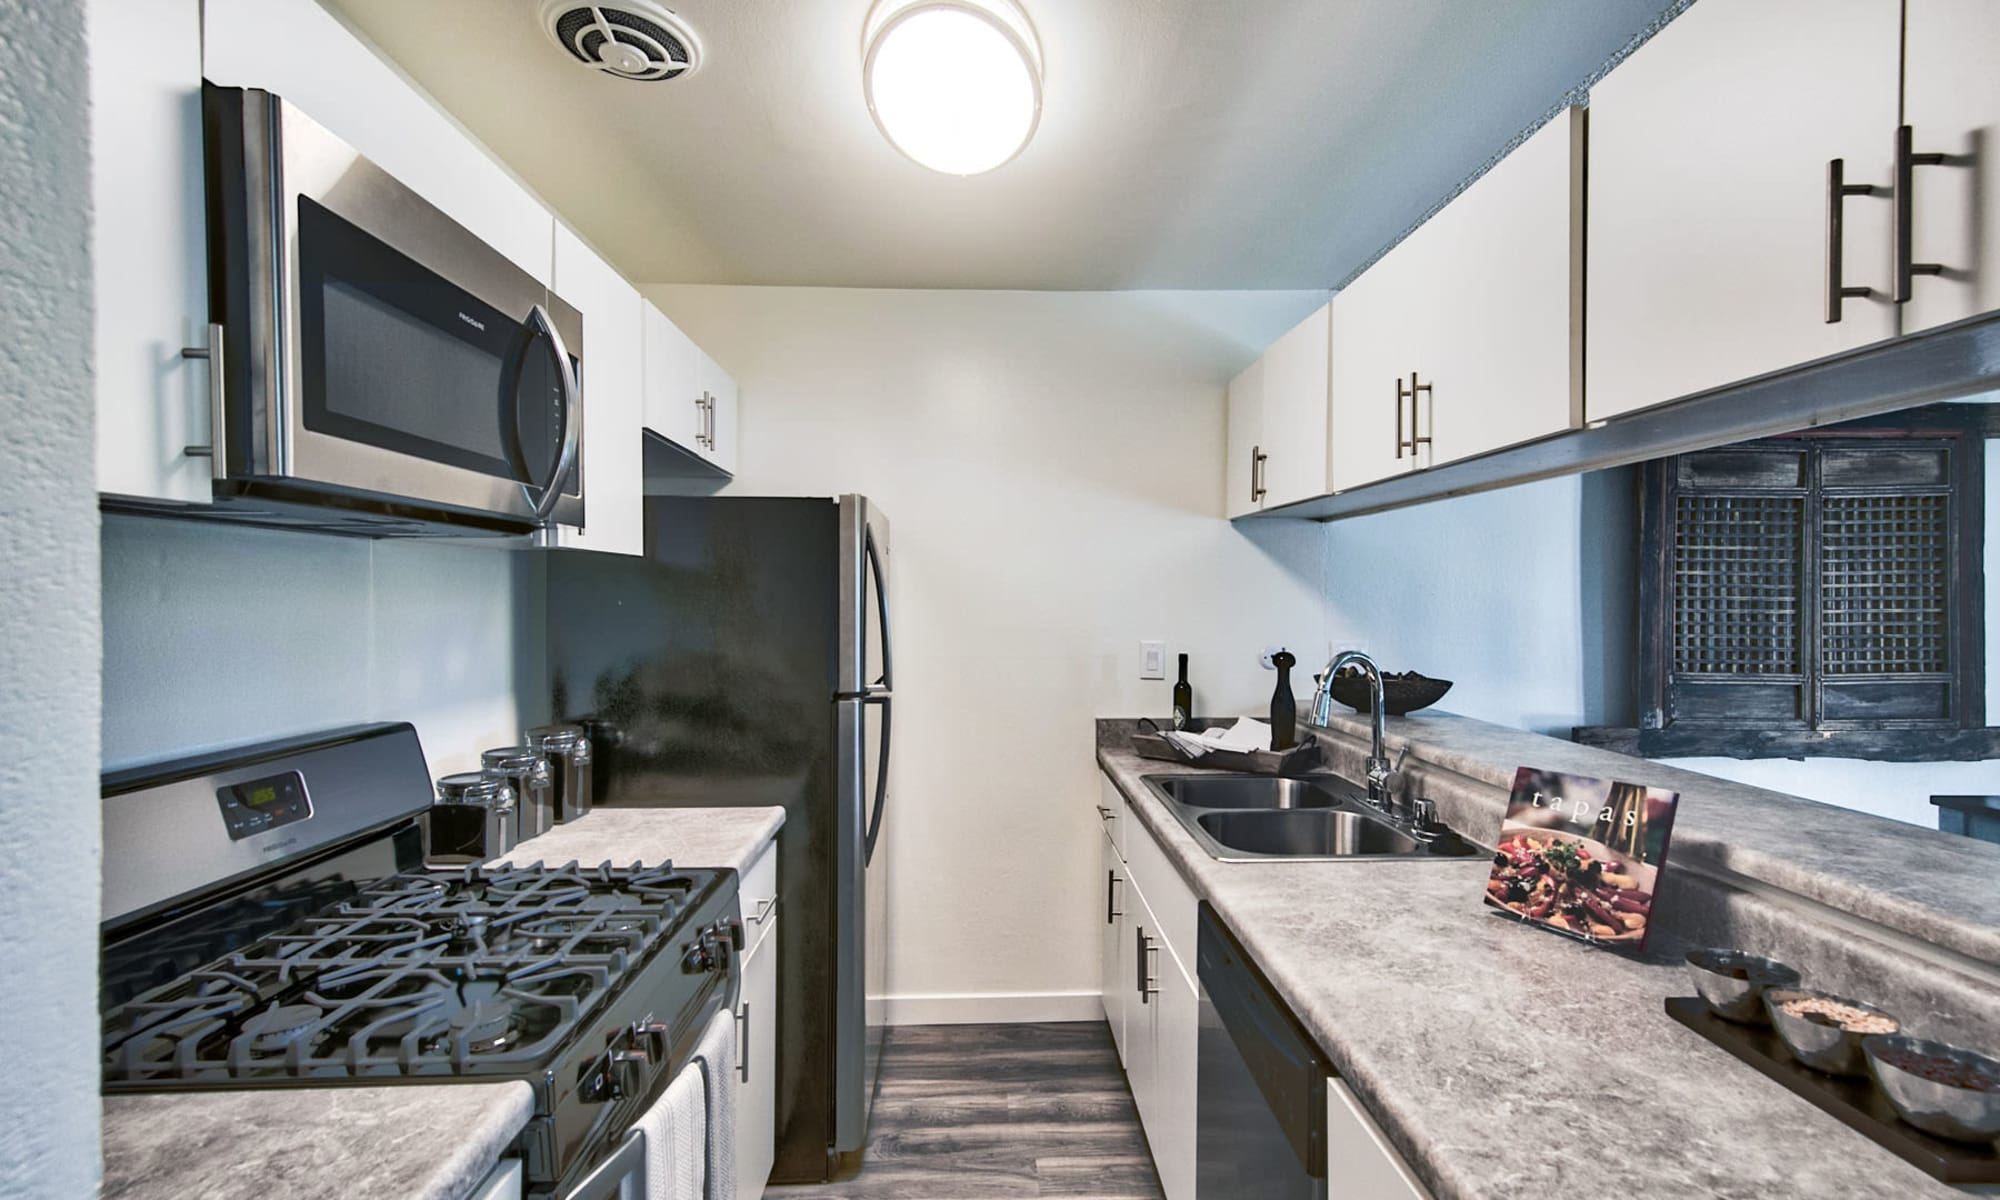 Hardwood flooring and granite countertops in a model apartment's kitchen at Mediterranean Village Apartments in Costa Mesa, California